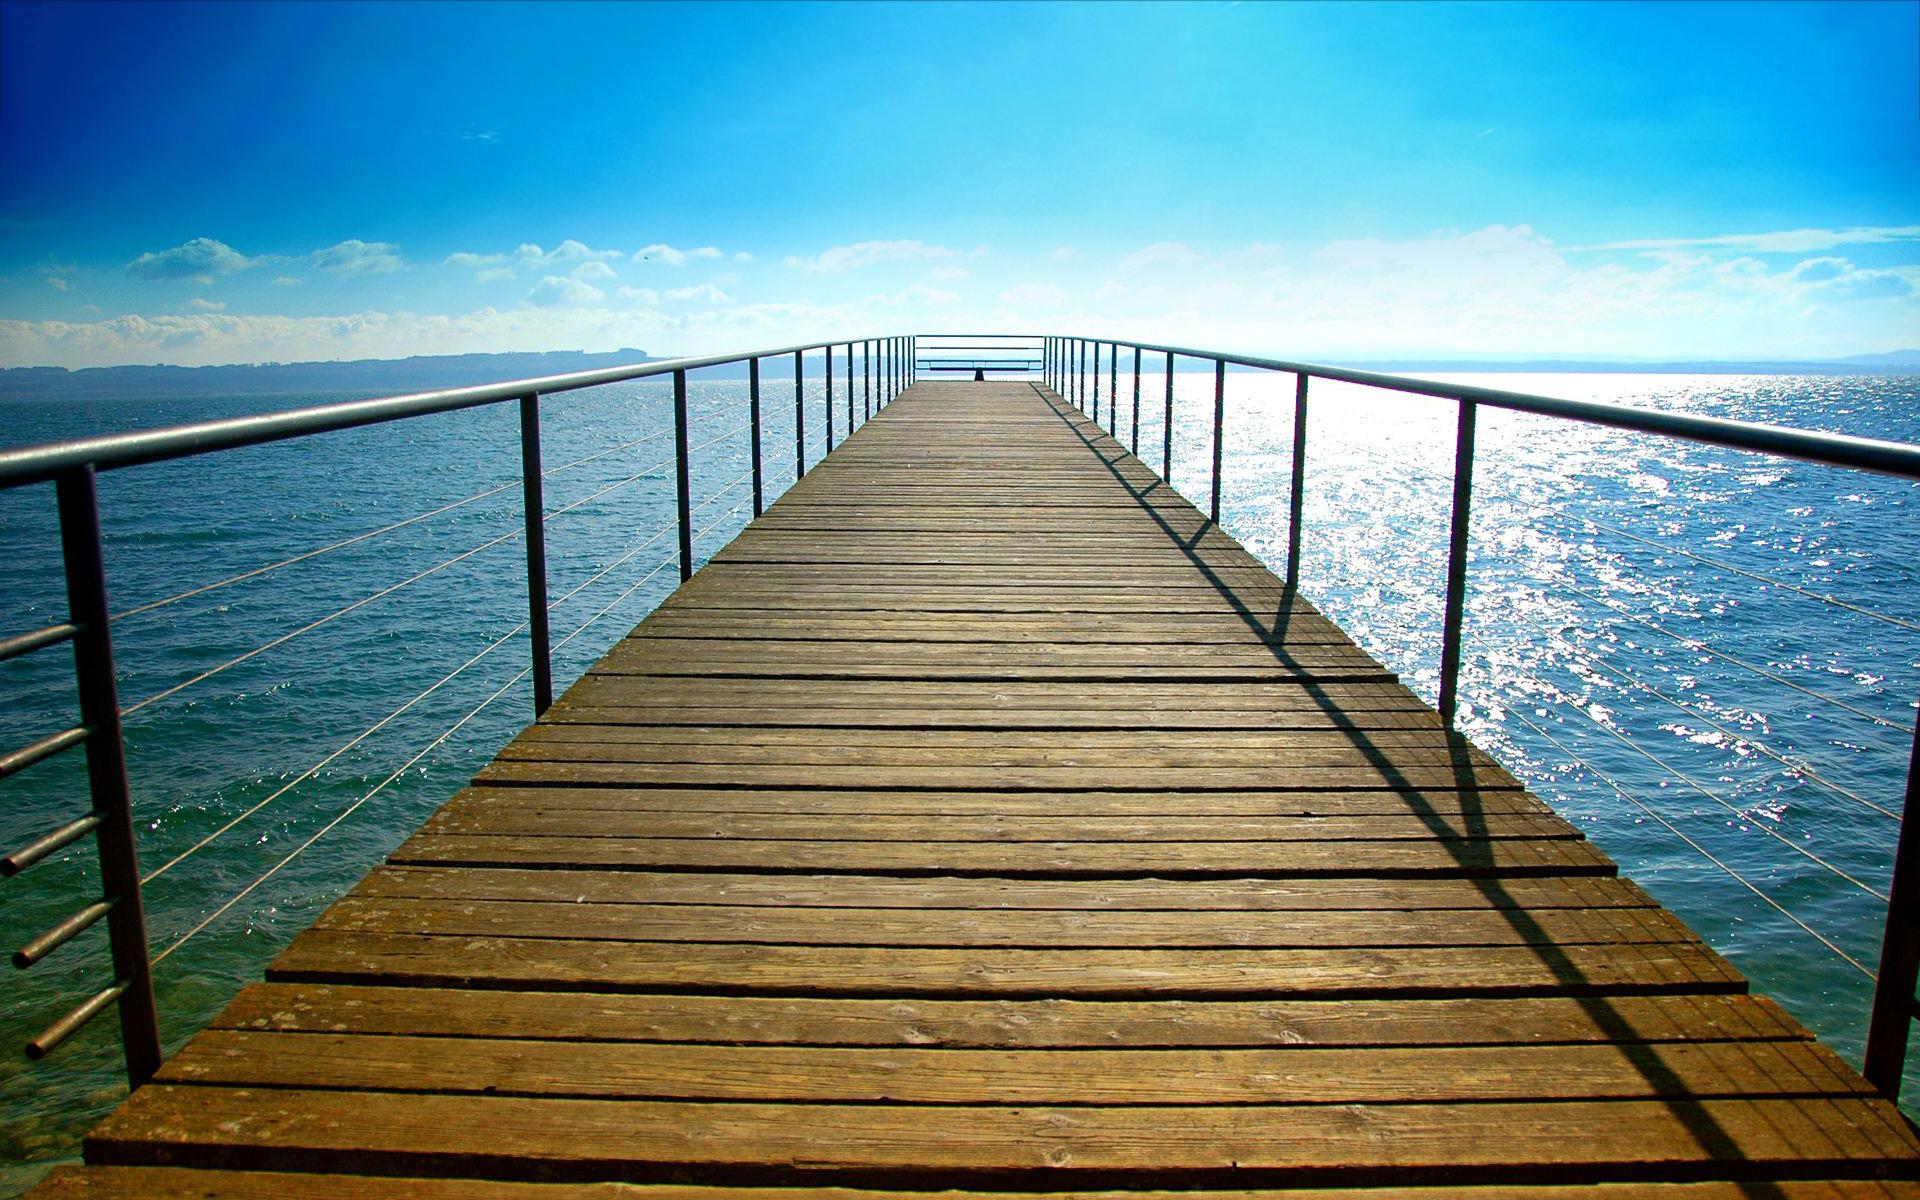 Sunny day lake bridge